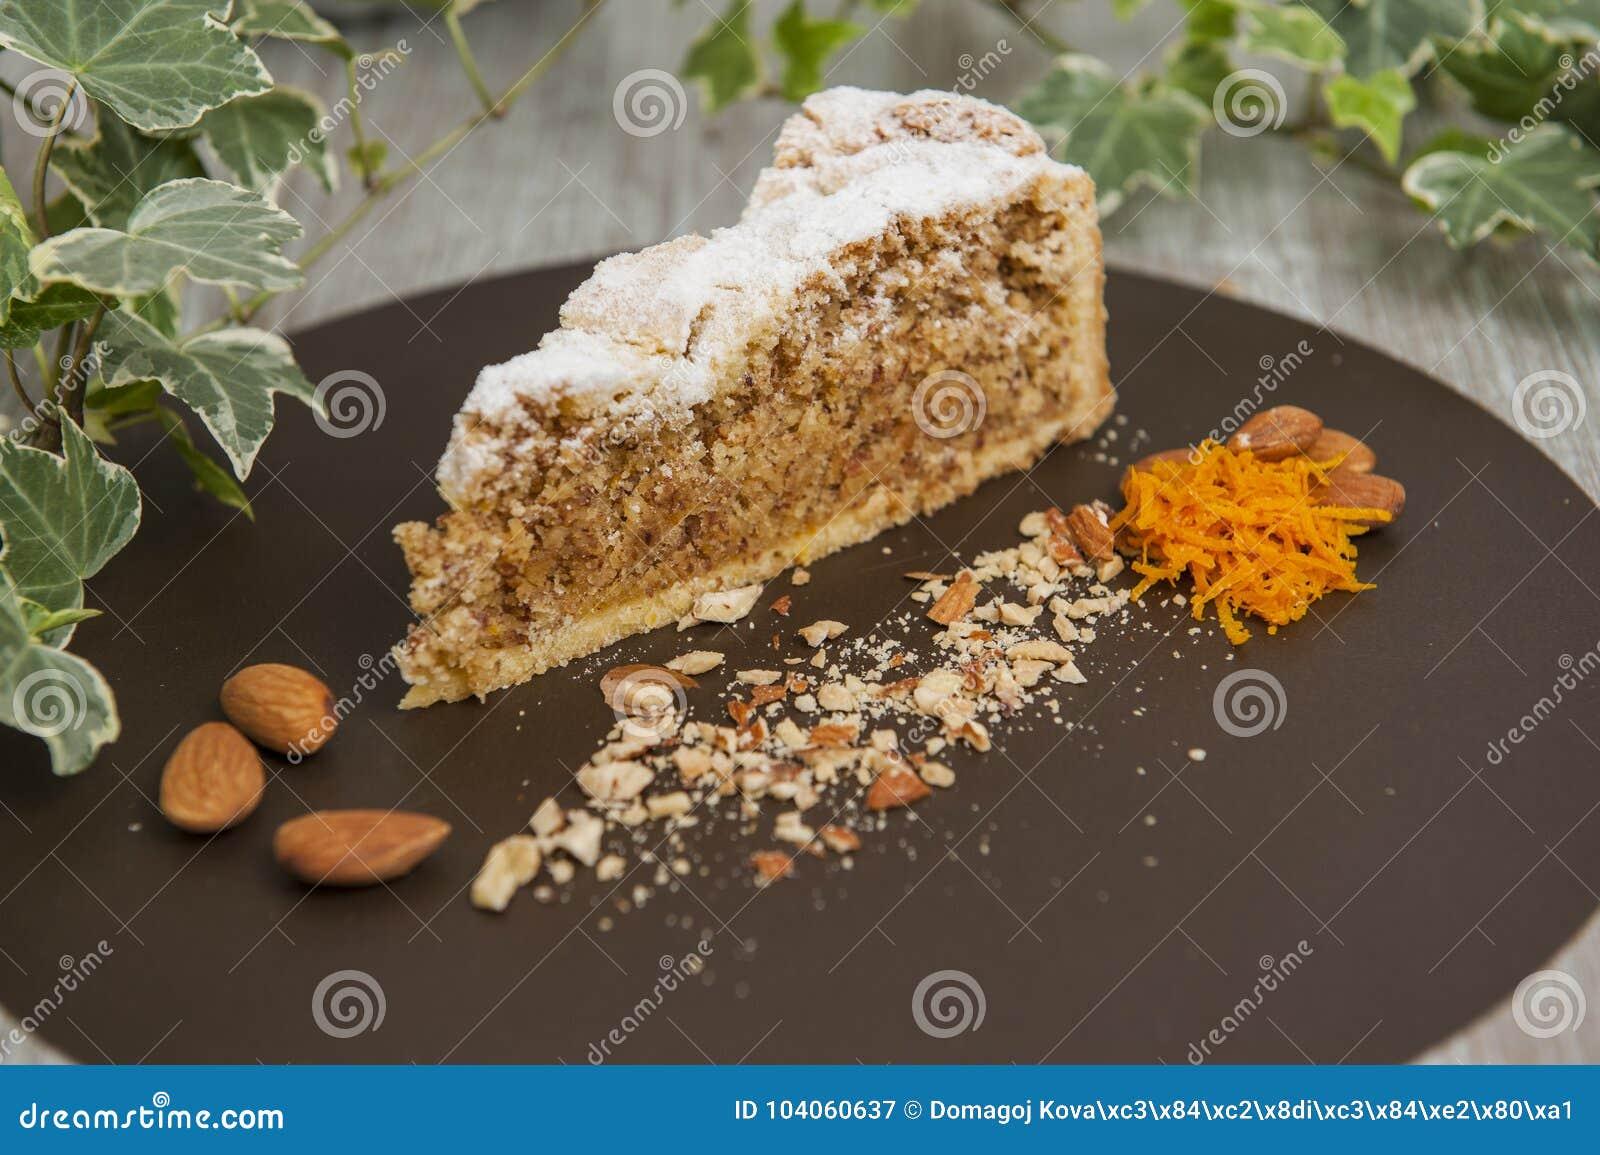 Fatia de bolo da amêndoa